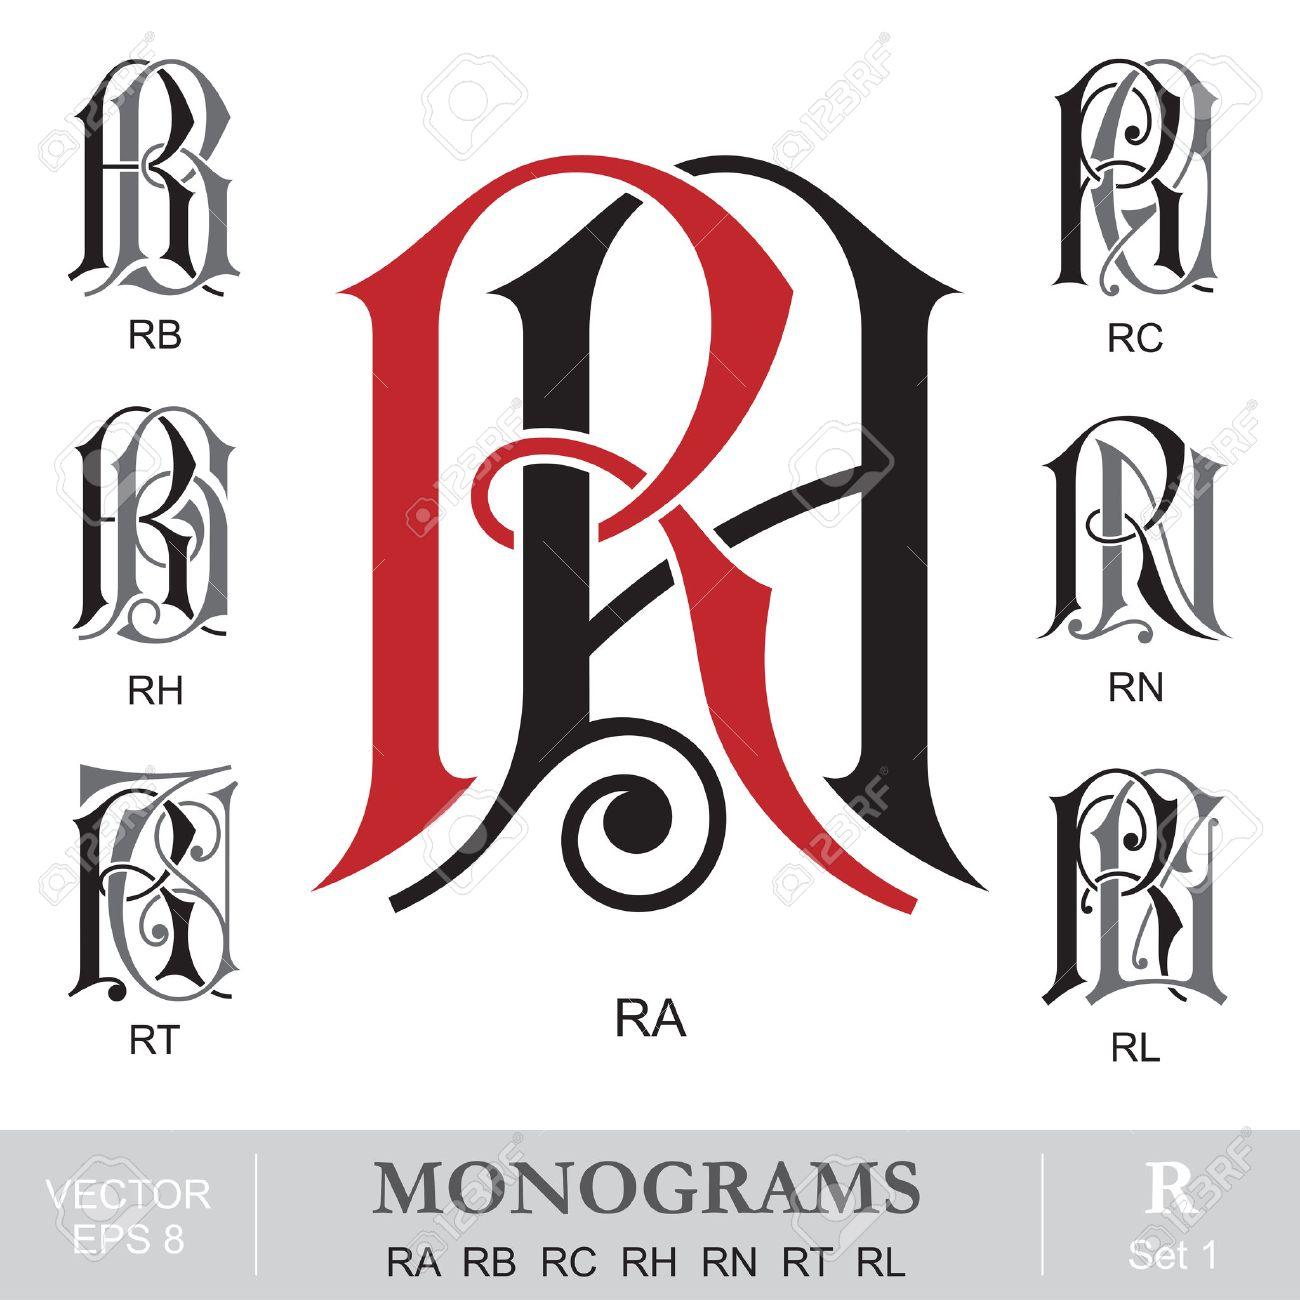 247 rb stock illustrations cliparts and royalty free rb vectors vintage monograms ra rb rc rh rn rt rl illustration buycottarizona Choice Image